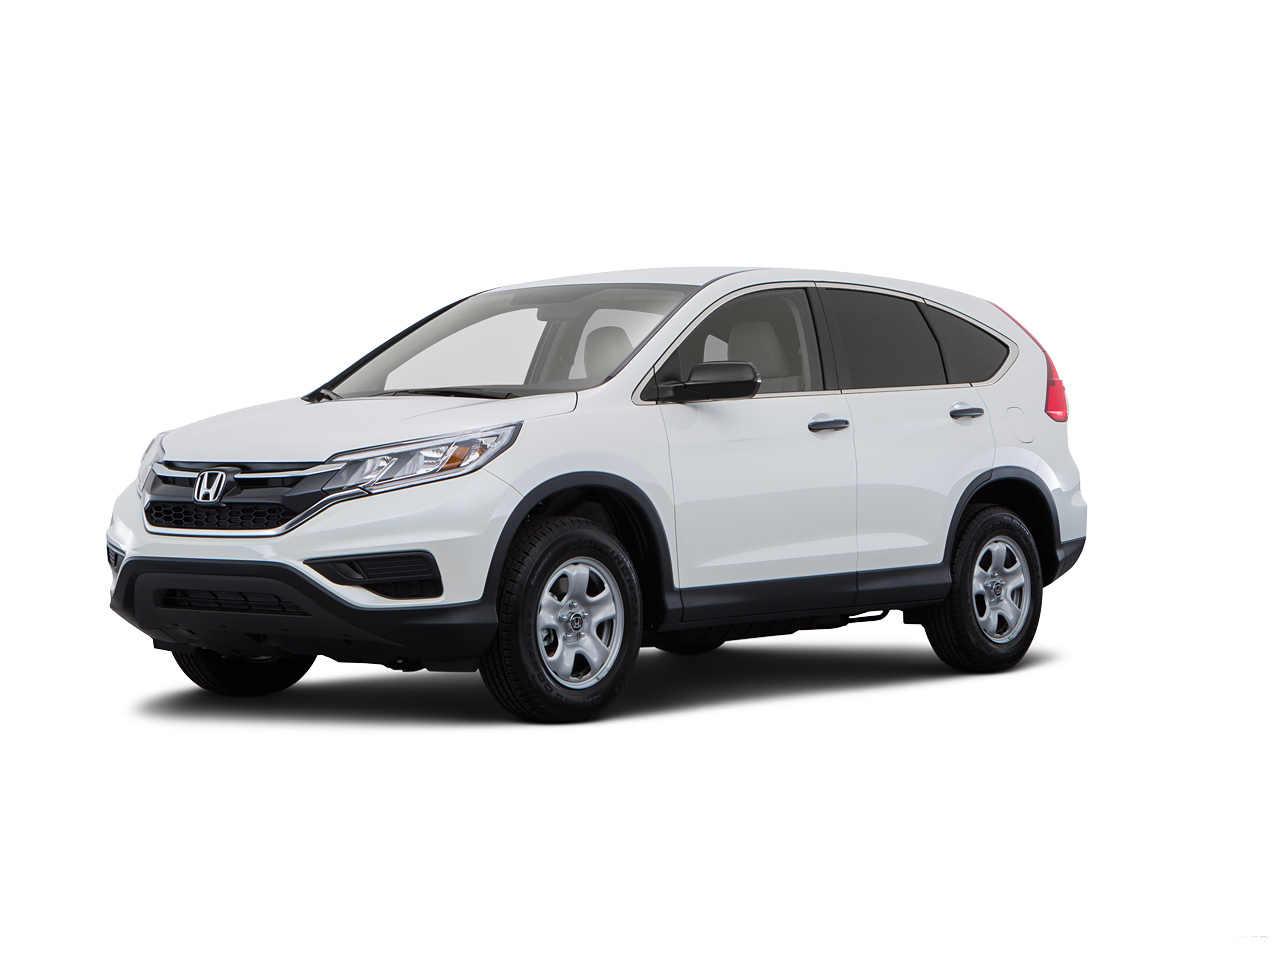 Honda has imported the cr v diesel to india drivespark news for Honda crv india